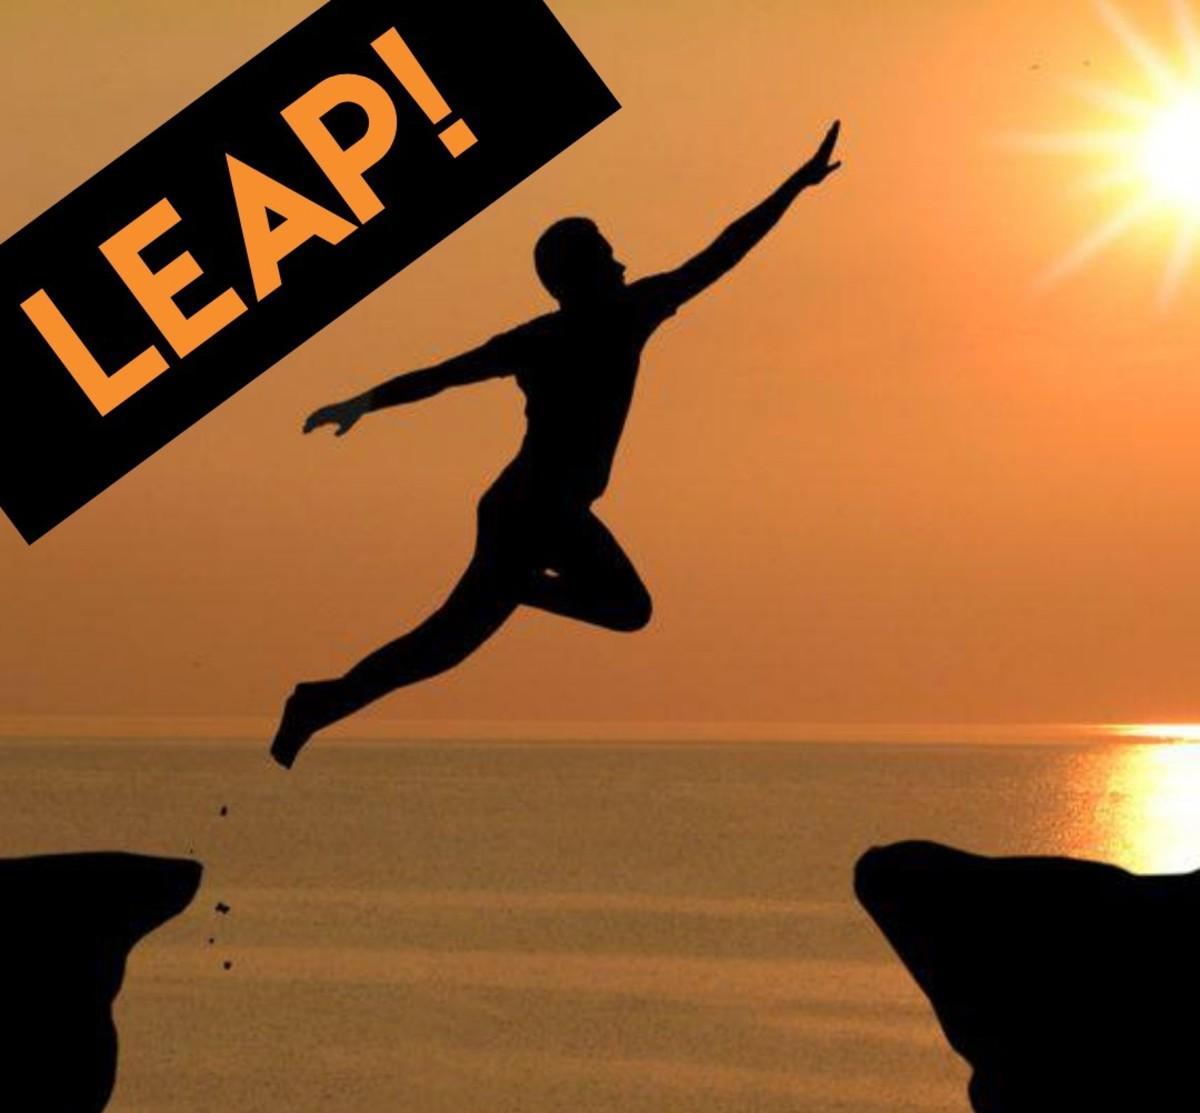 Leap! (The Poem)